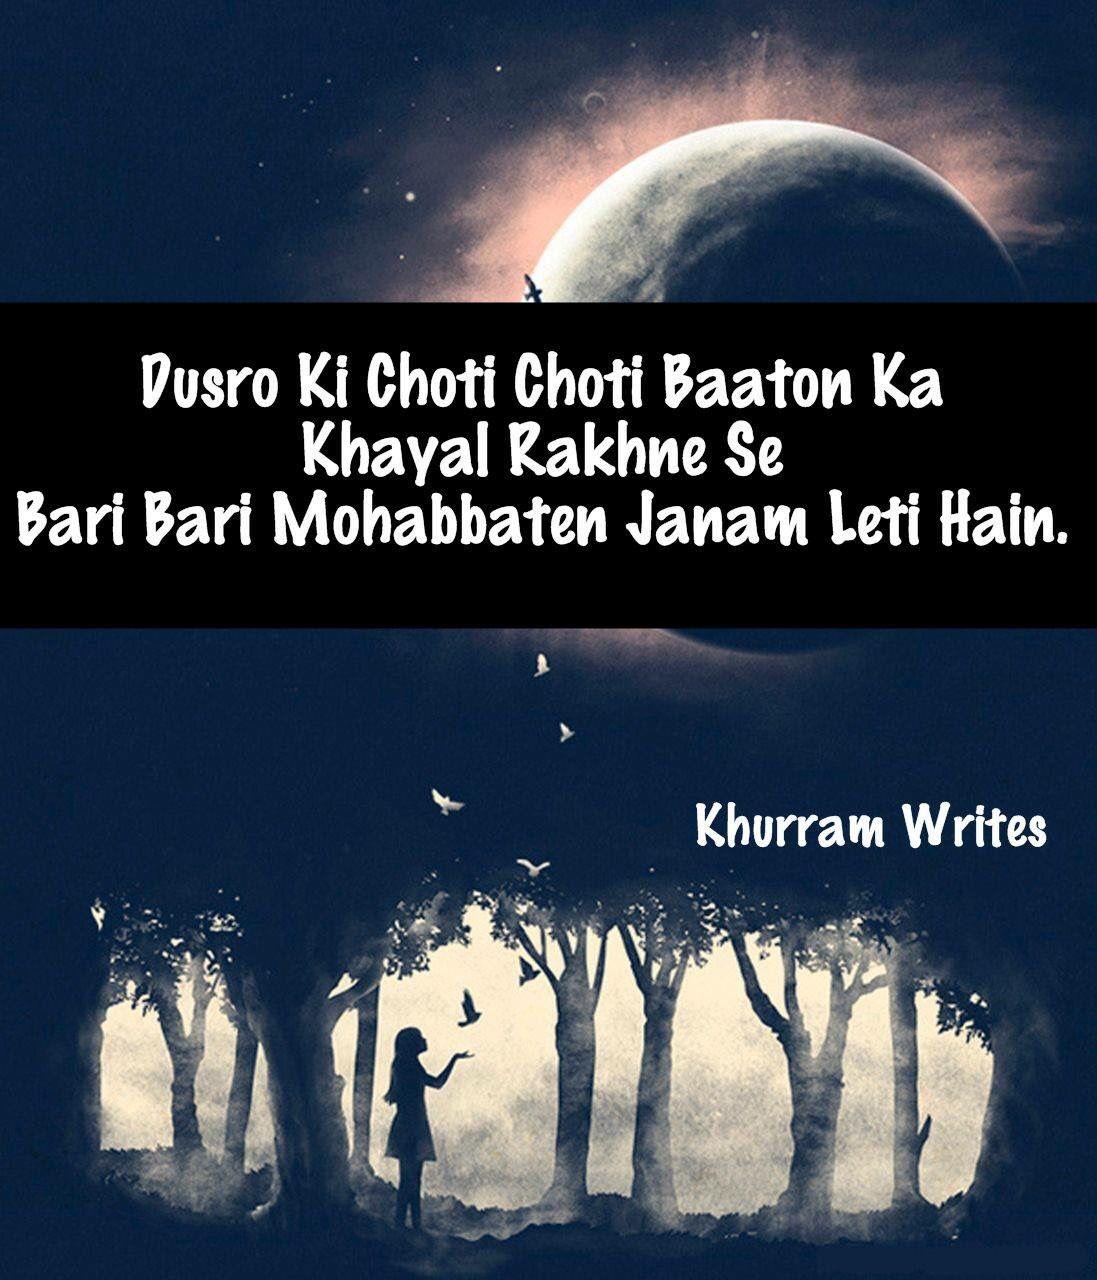 Shayari heart touching Shayaris Pinterest Urdu